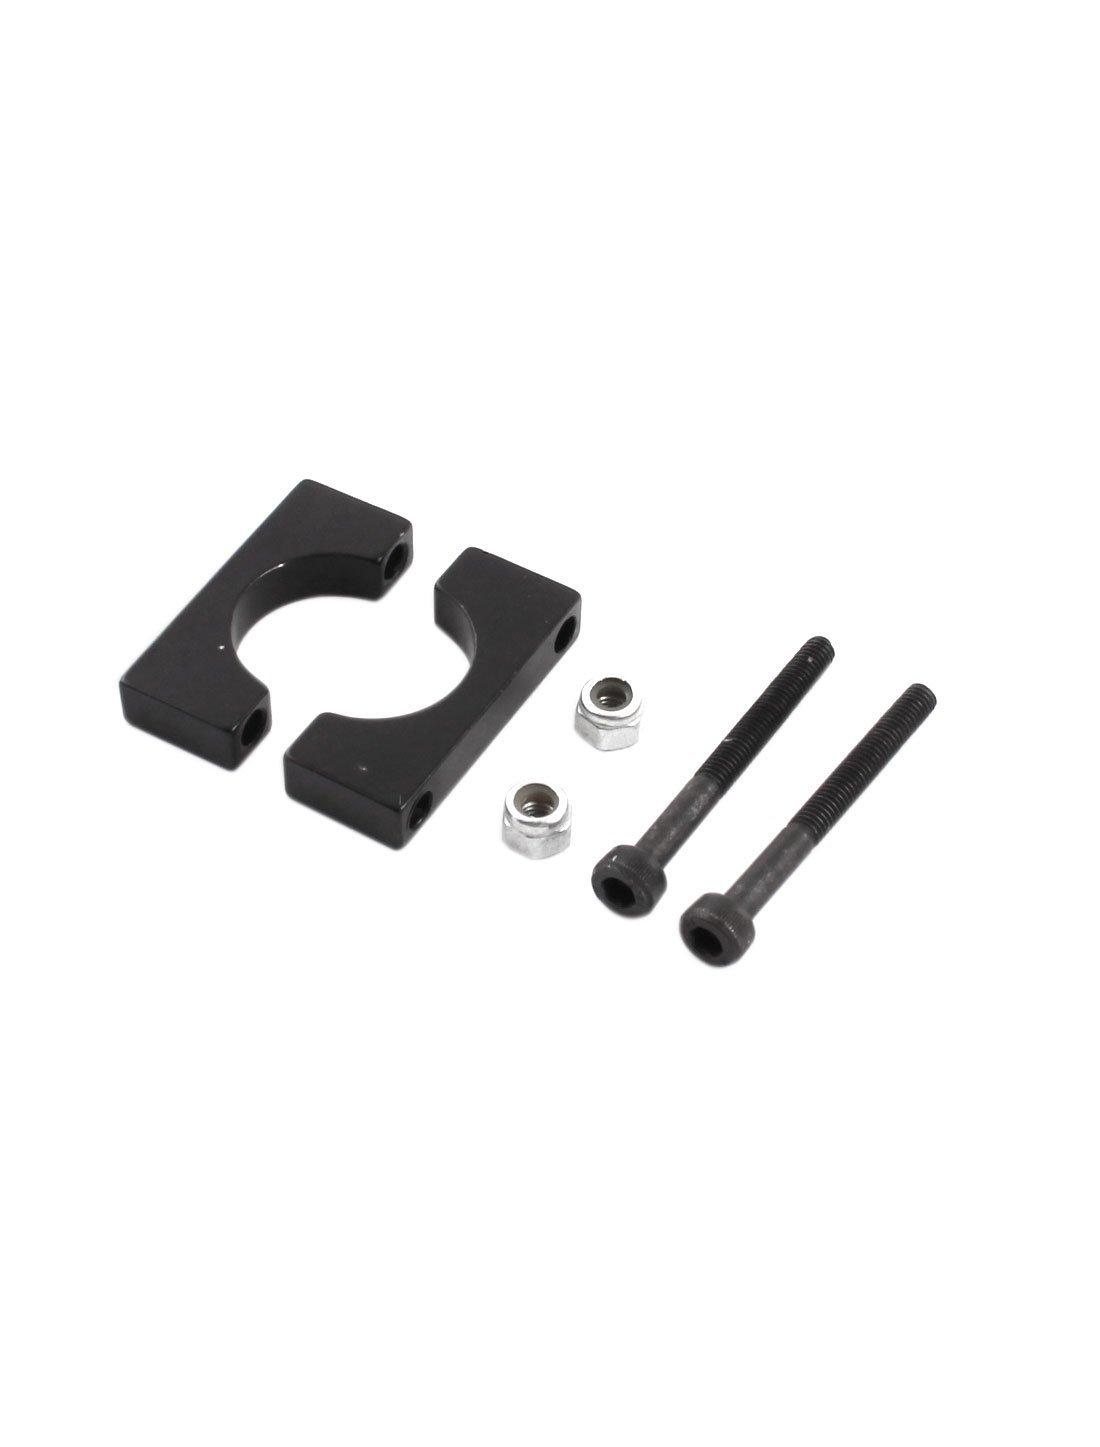 DealMux 10Pcs 16mm Aluminum Clamp Clip for Carbon Fiber Tube RC Multirotor